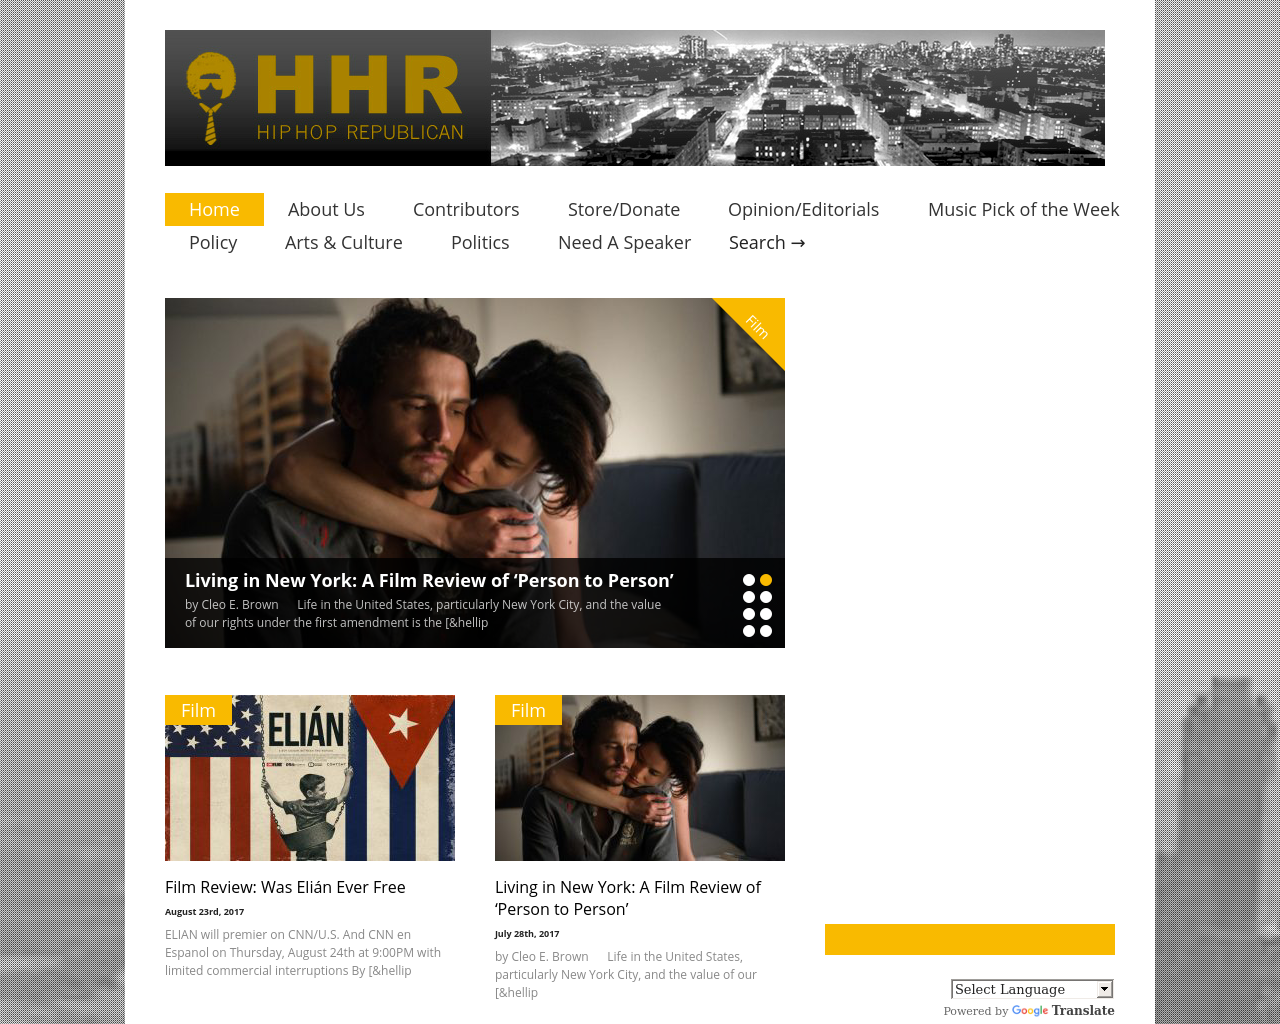 HHR-HipHop-Republican-Advertising-Reviews-Pricing